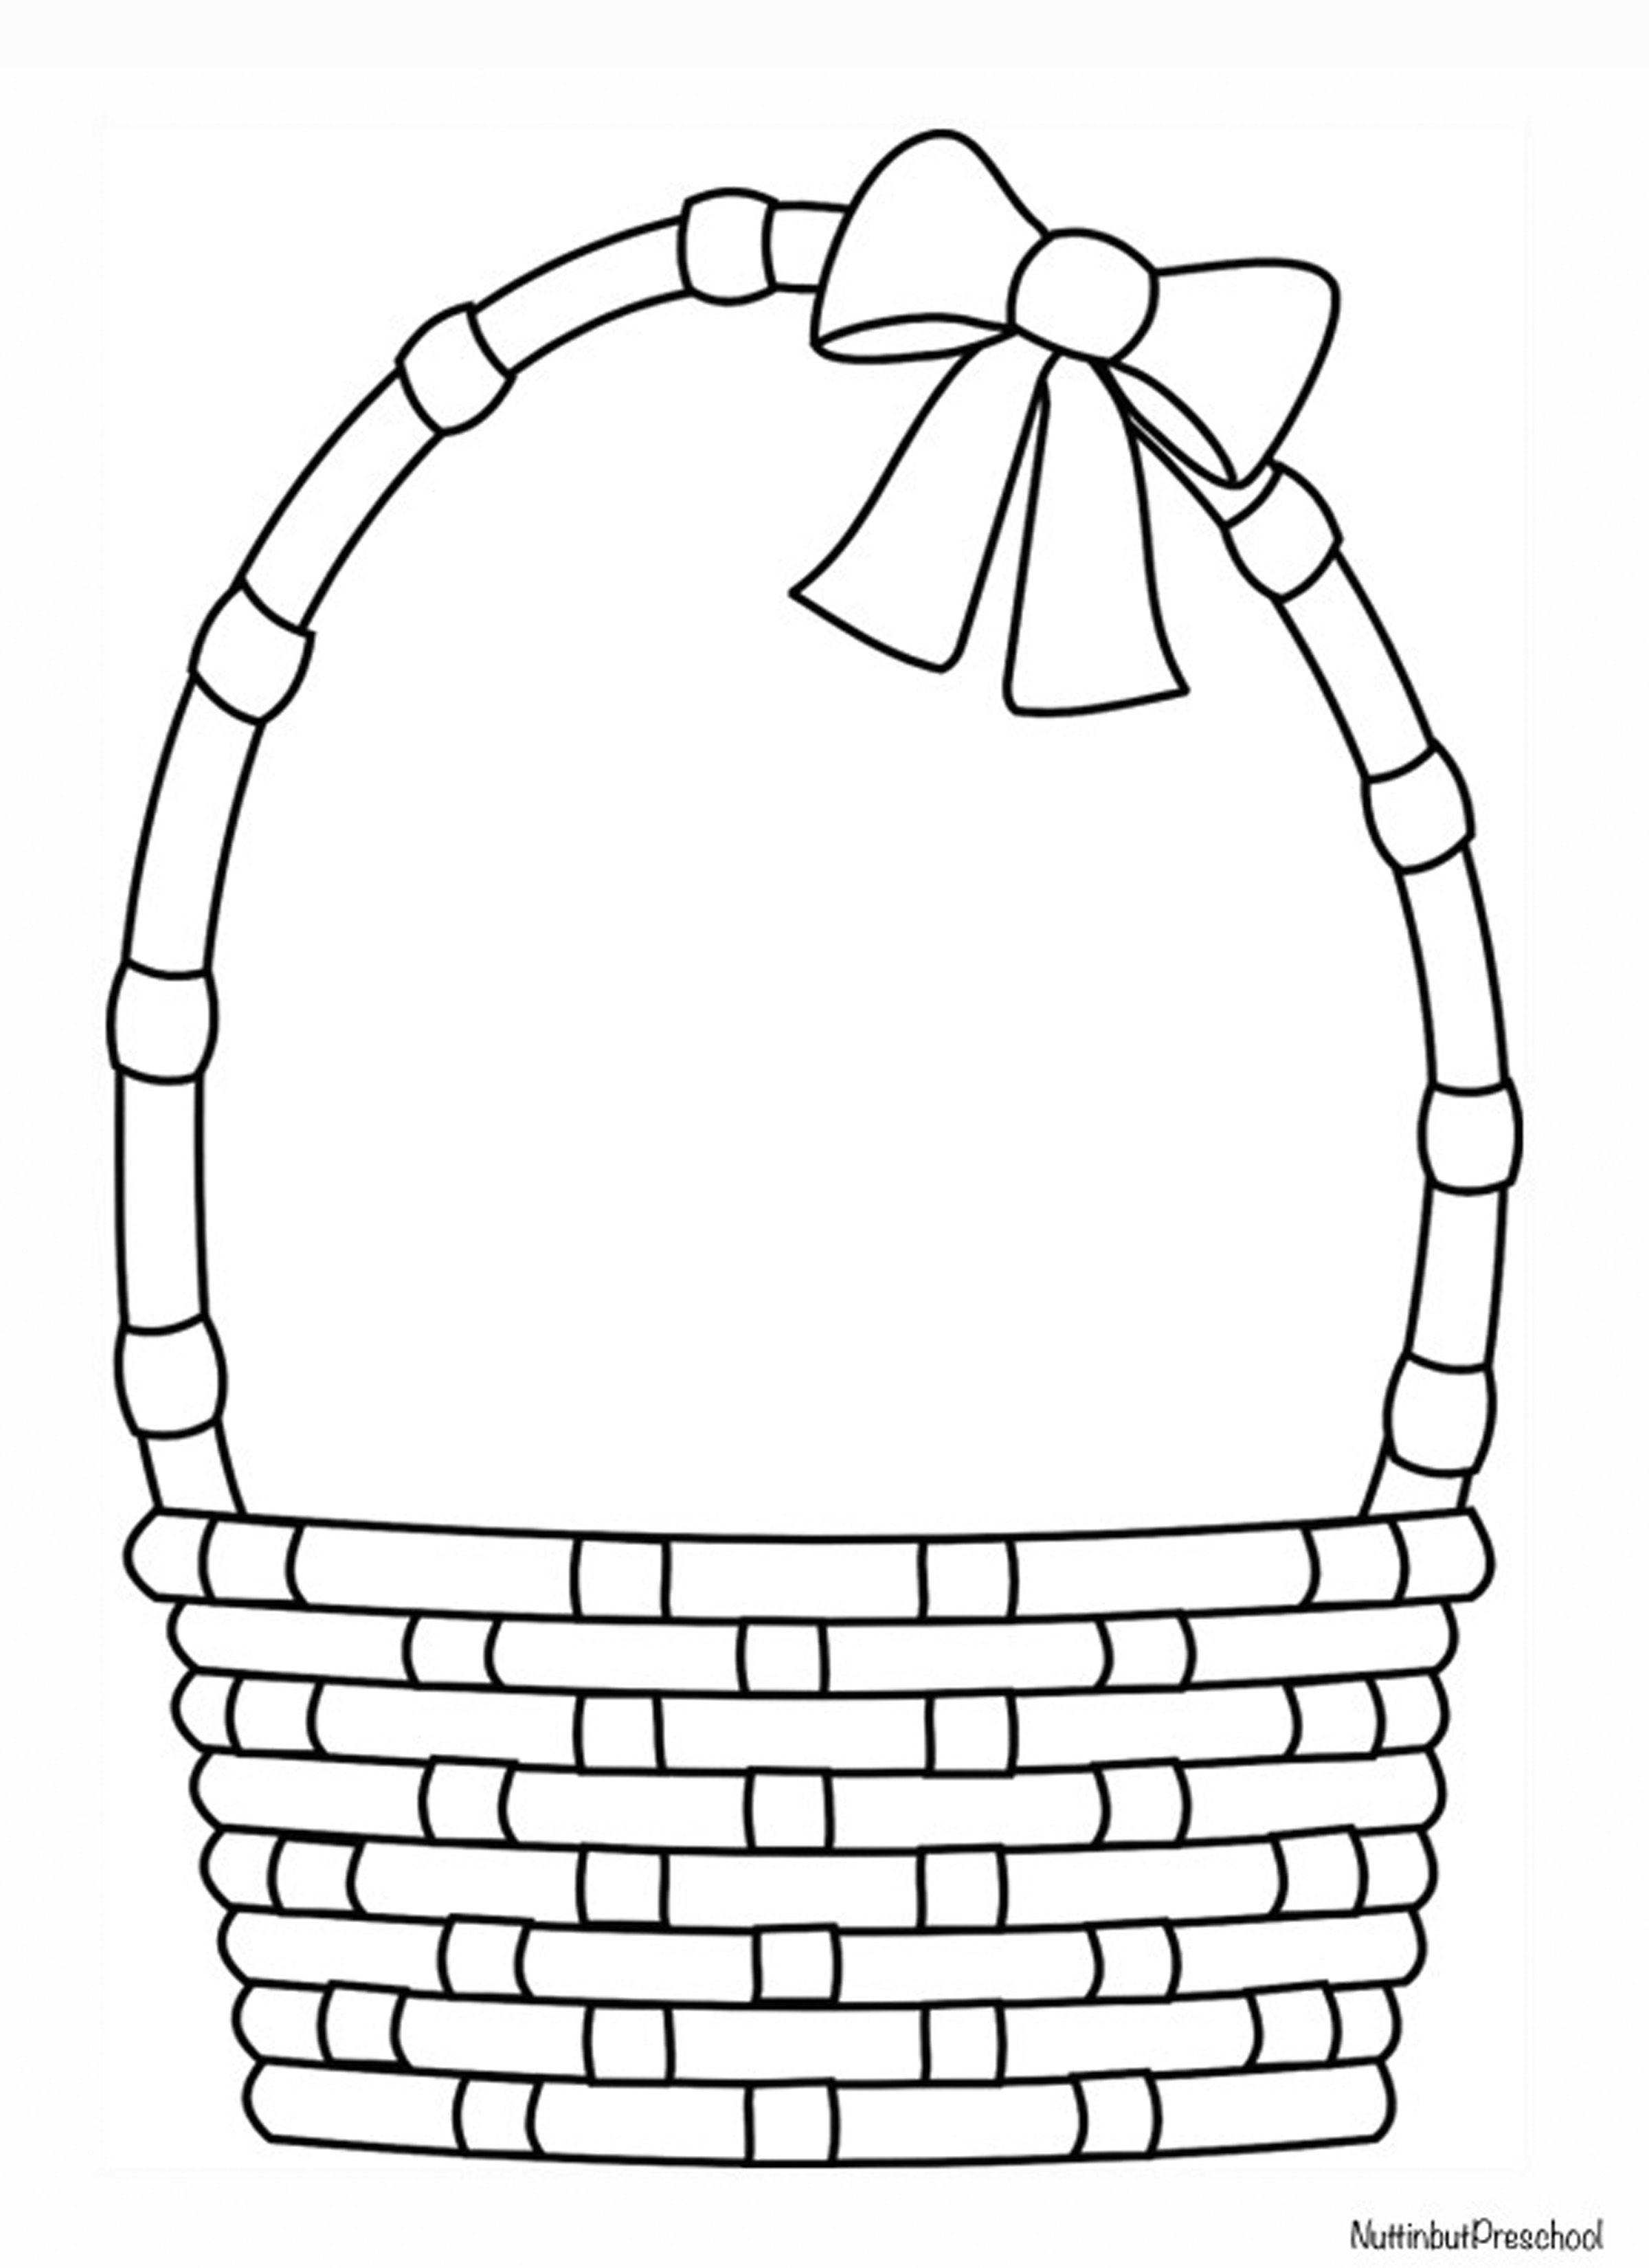 Easter Basket Pattern | Nuttin' But Preschool | Easter Craft - Free Printable Coloring Pages Easter Basket